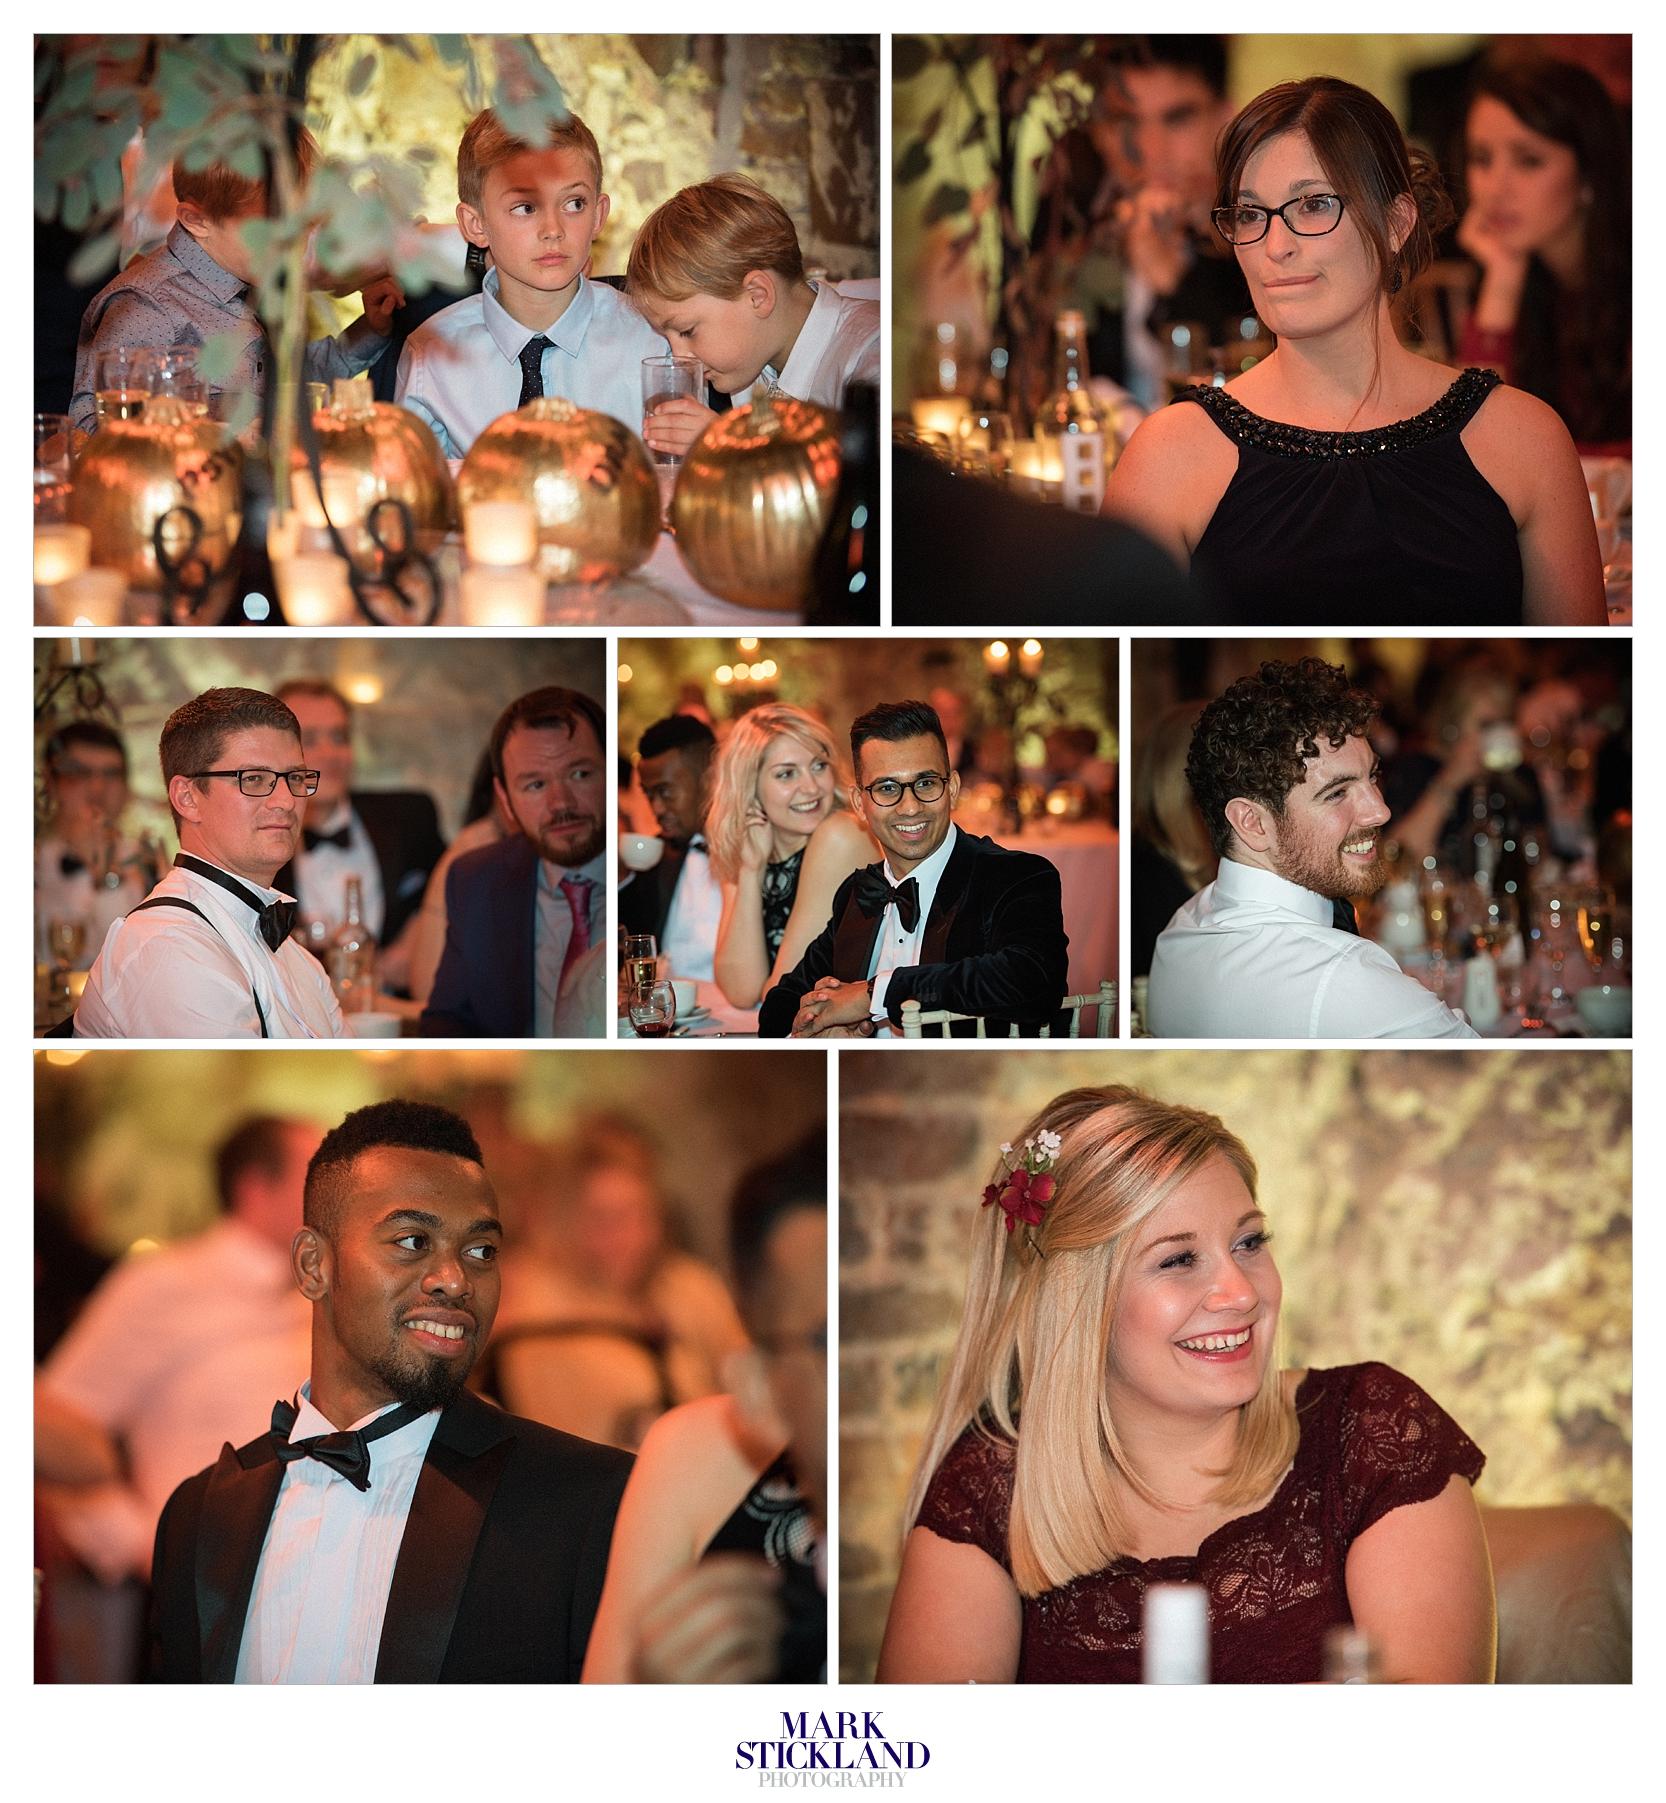 lulworth_castle_wedding_dorset_mark stickland photography.32